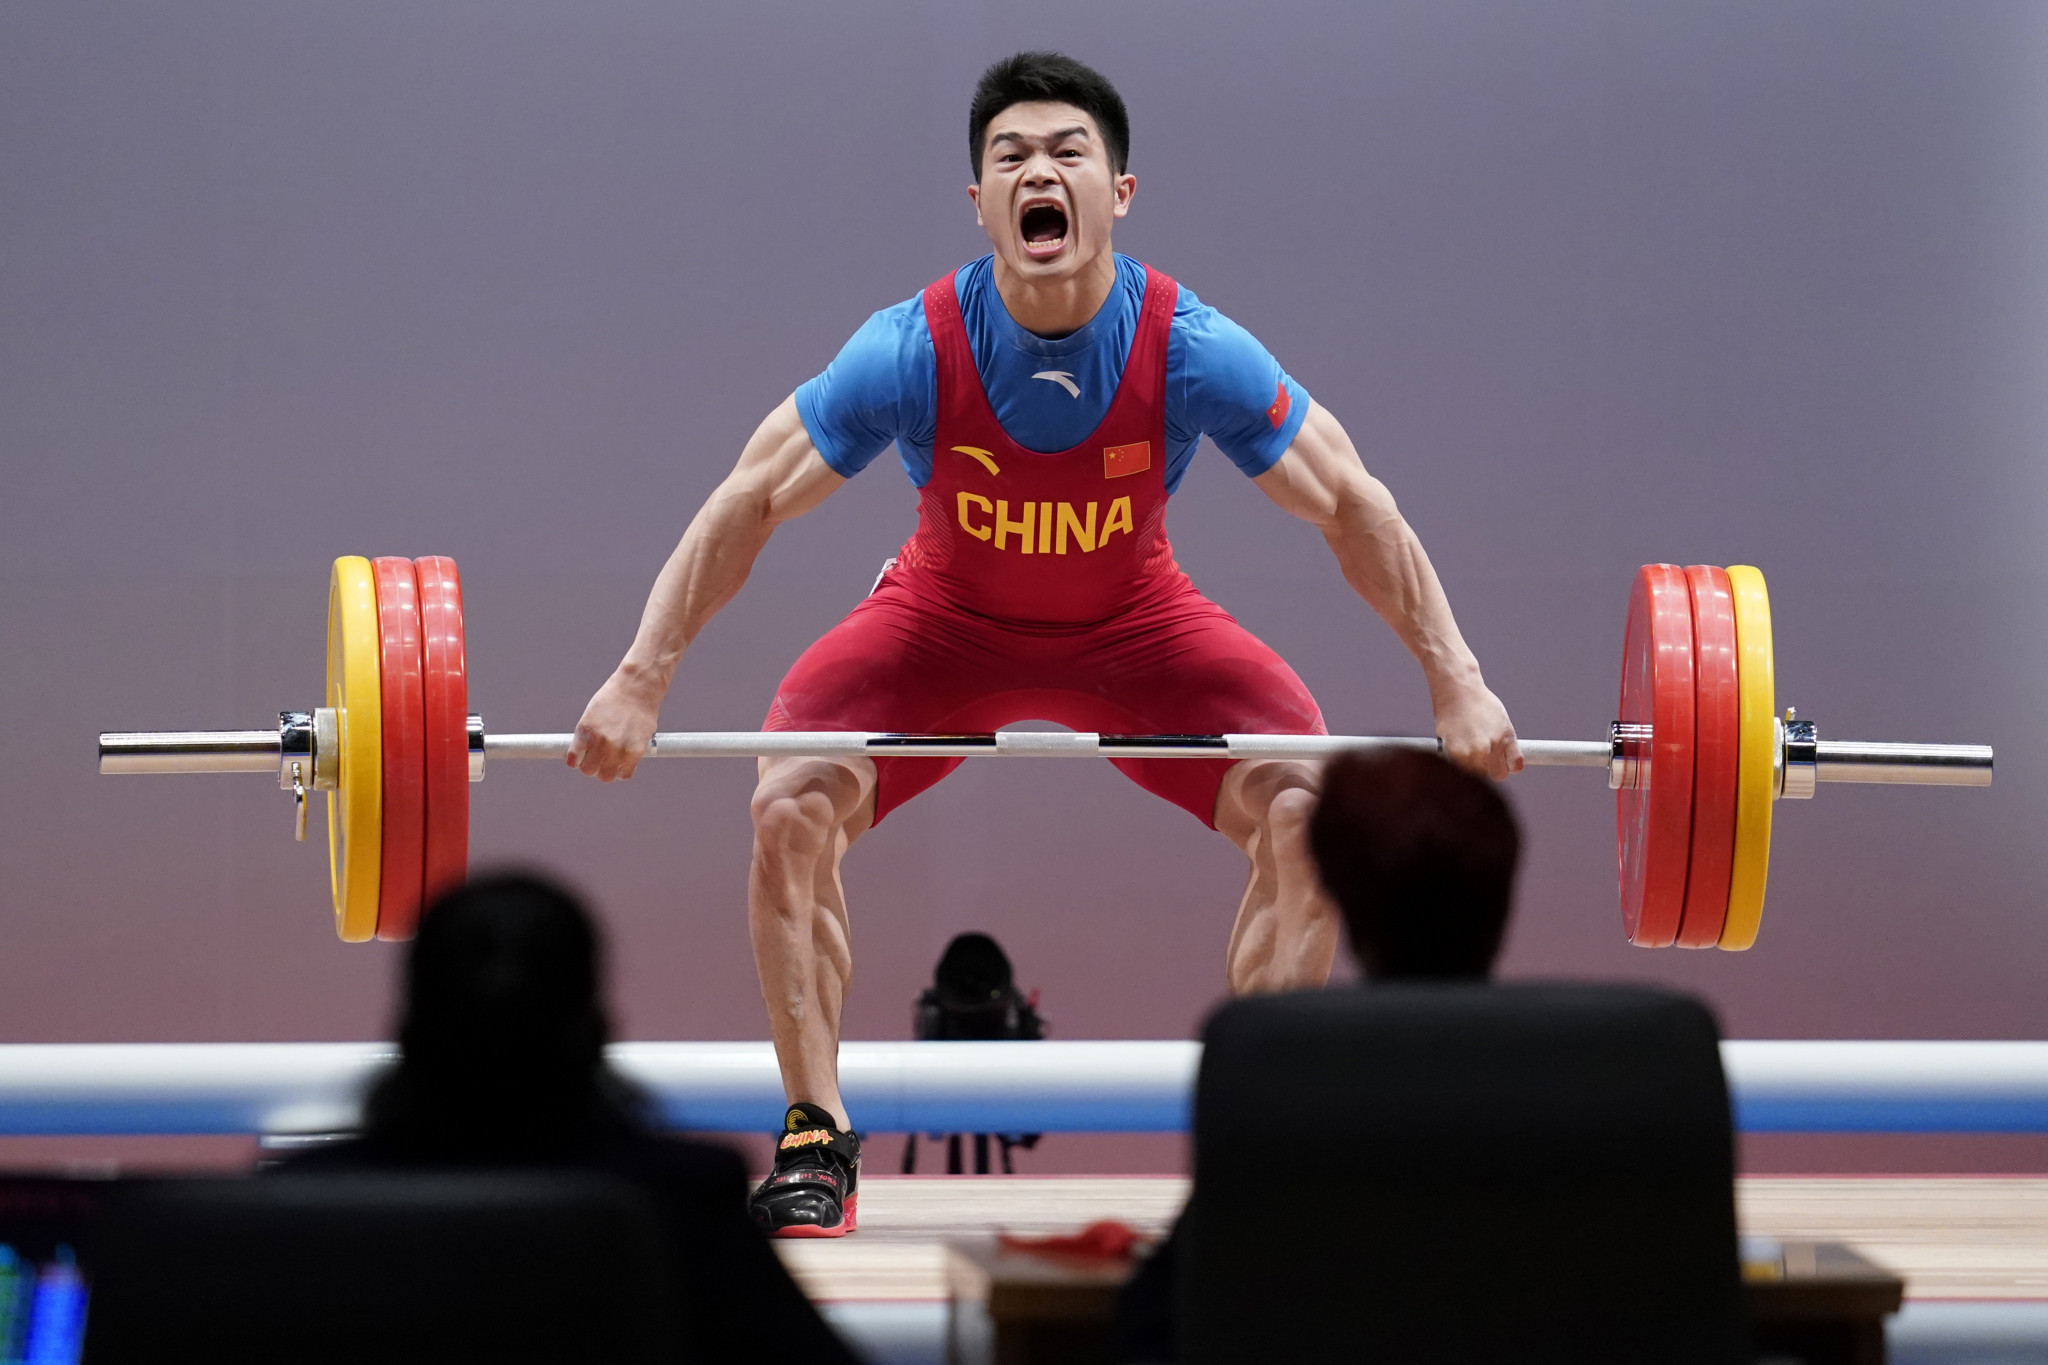 China's Shi and United States' Delacruz shine at continental weightlifting championships